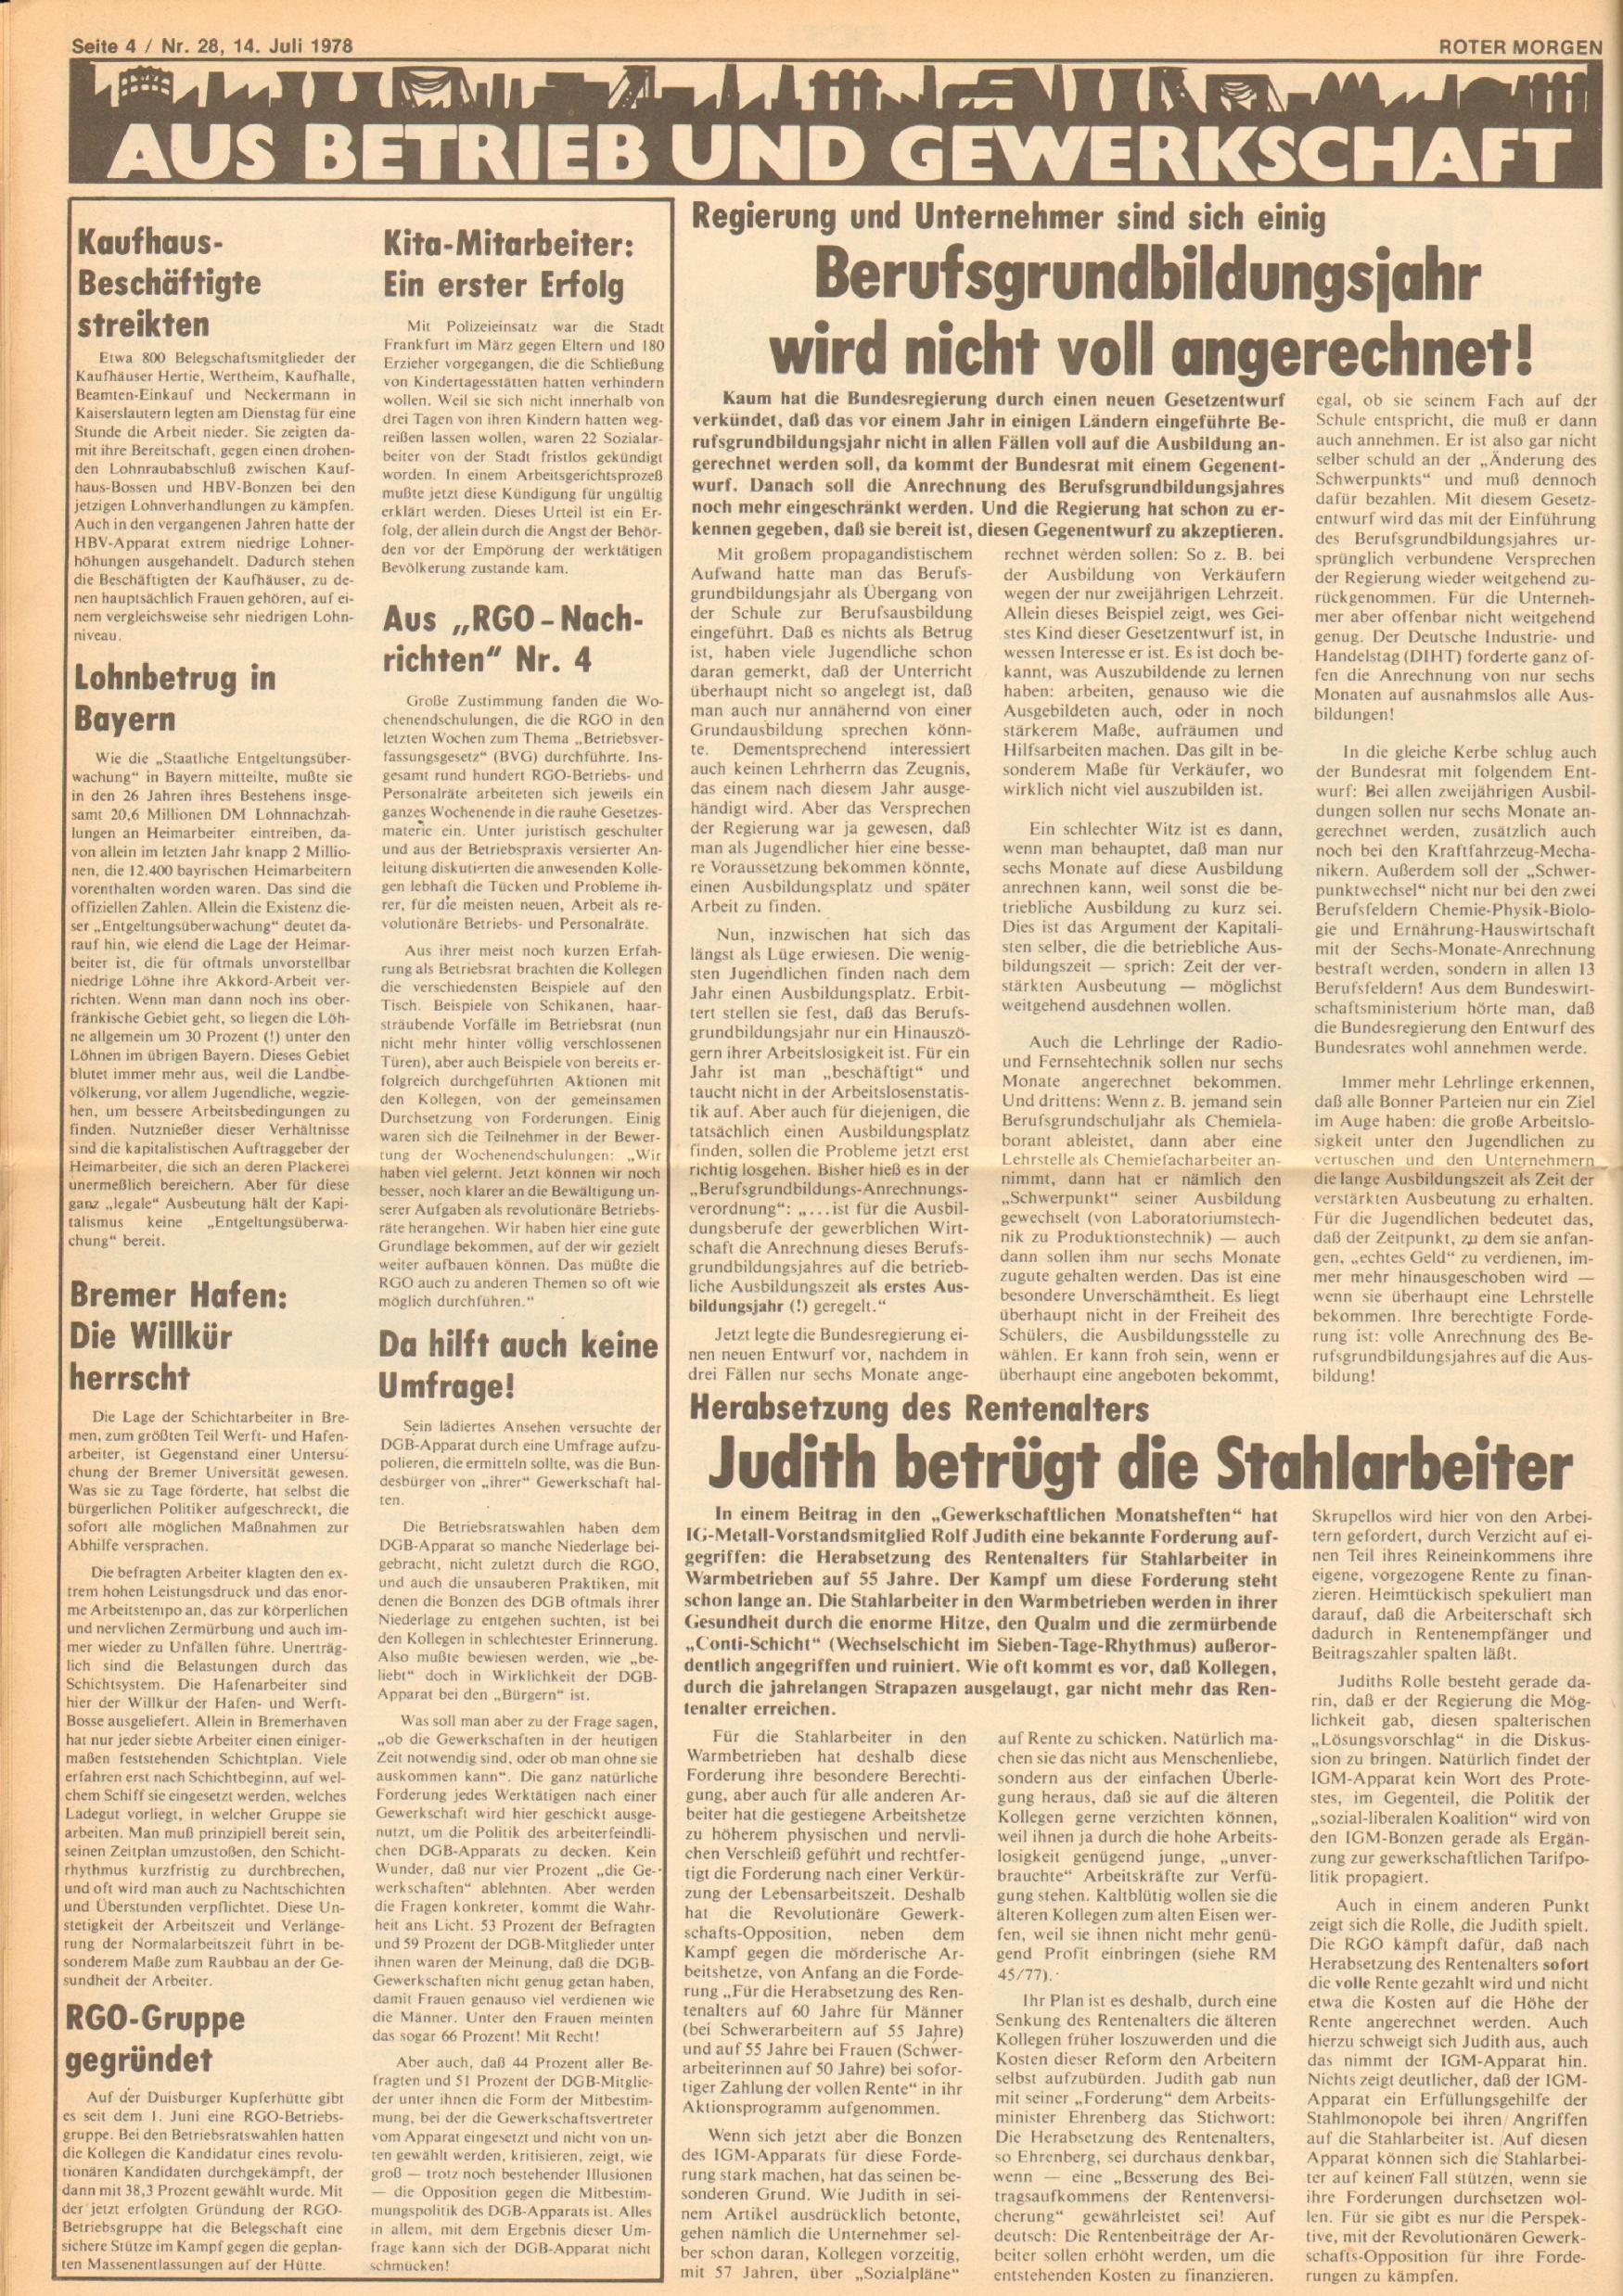 Roter Morgen, 12. Jg., 16. Juli 1978, Nr. 28, Seite 4